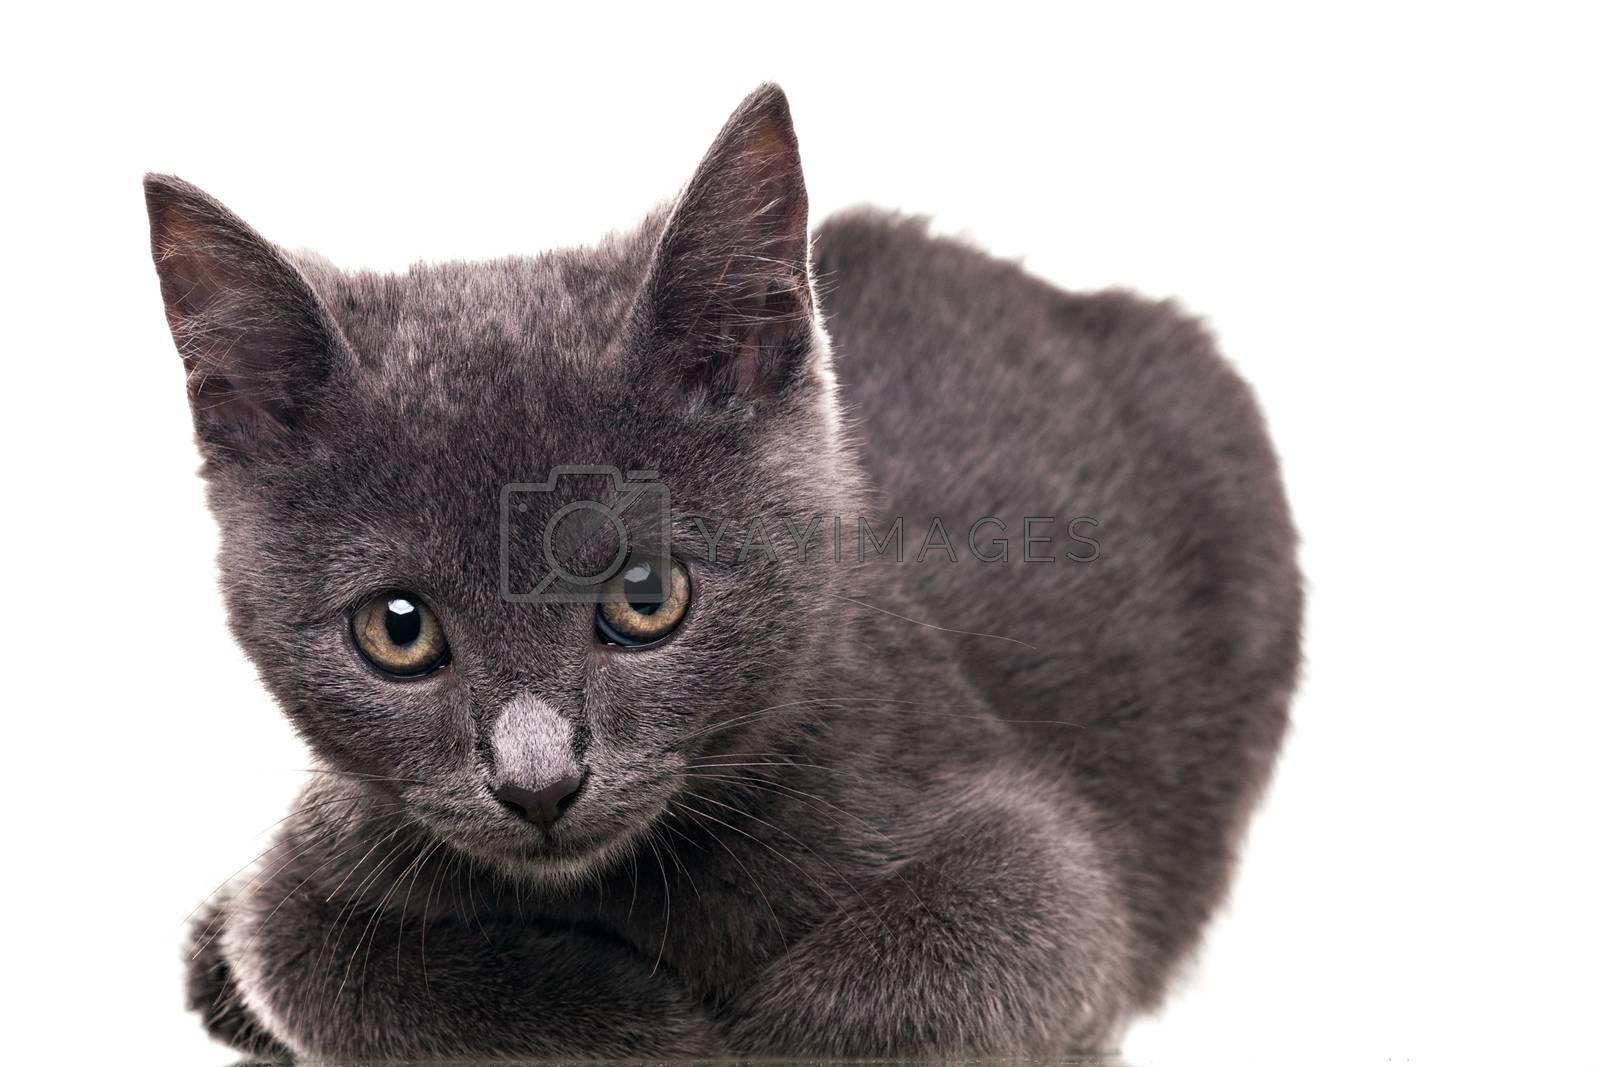 Chatreaux kitten portrait. Studio shot. Isolated on white background.